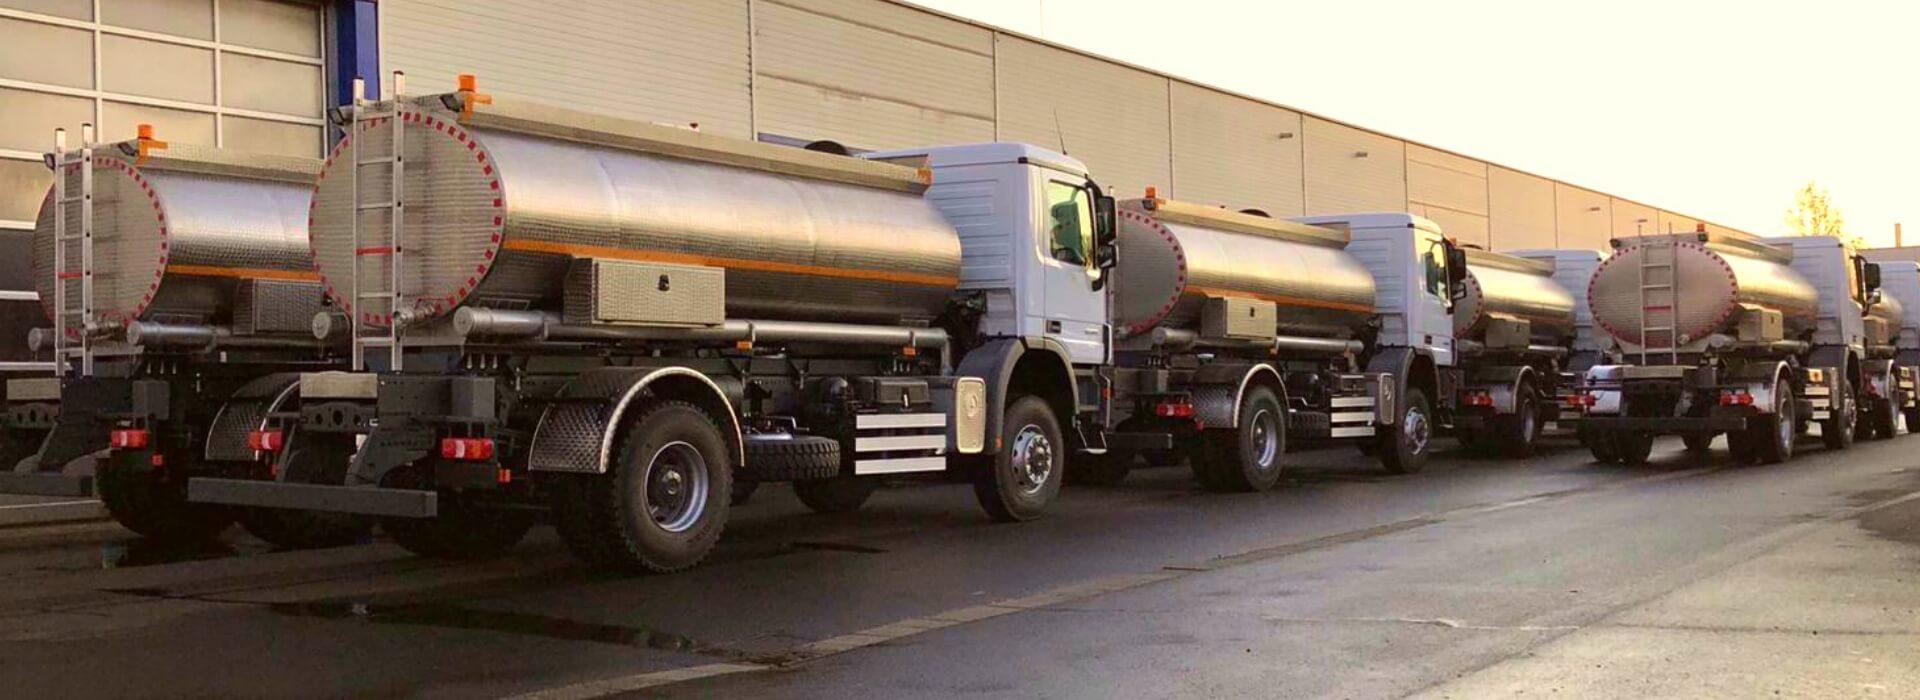 Teknik Tanker